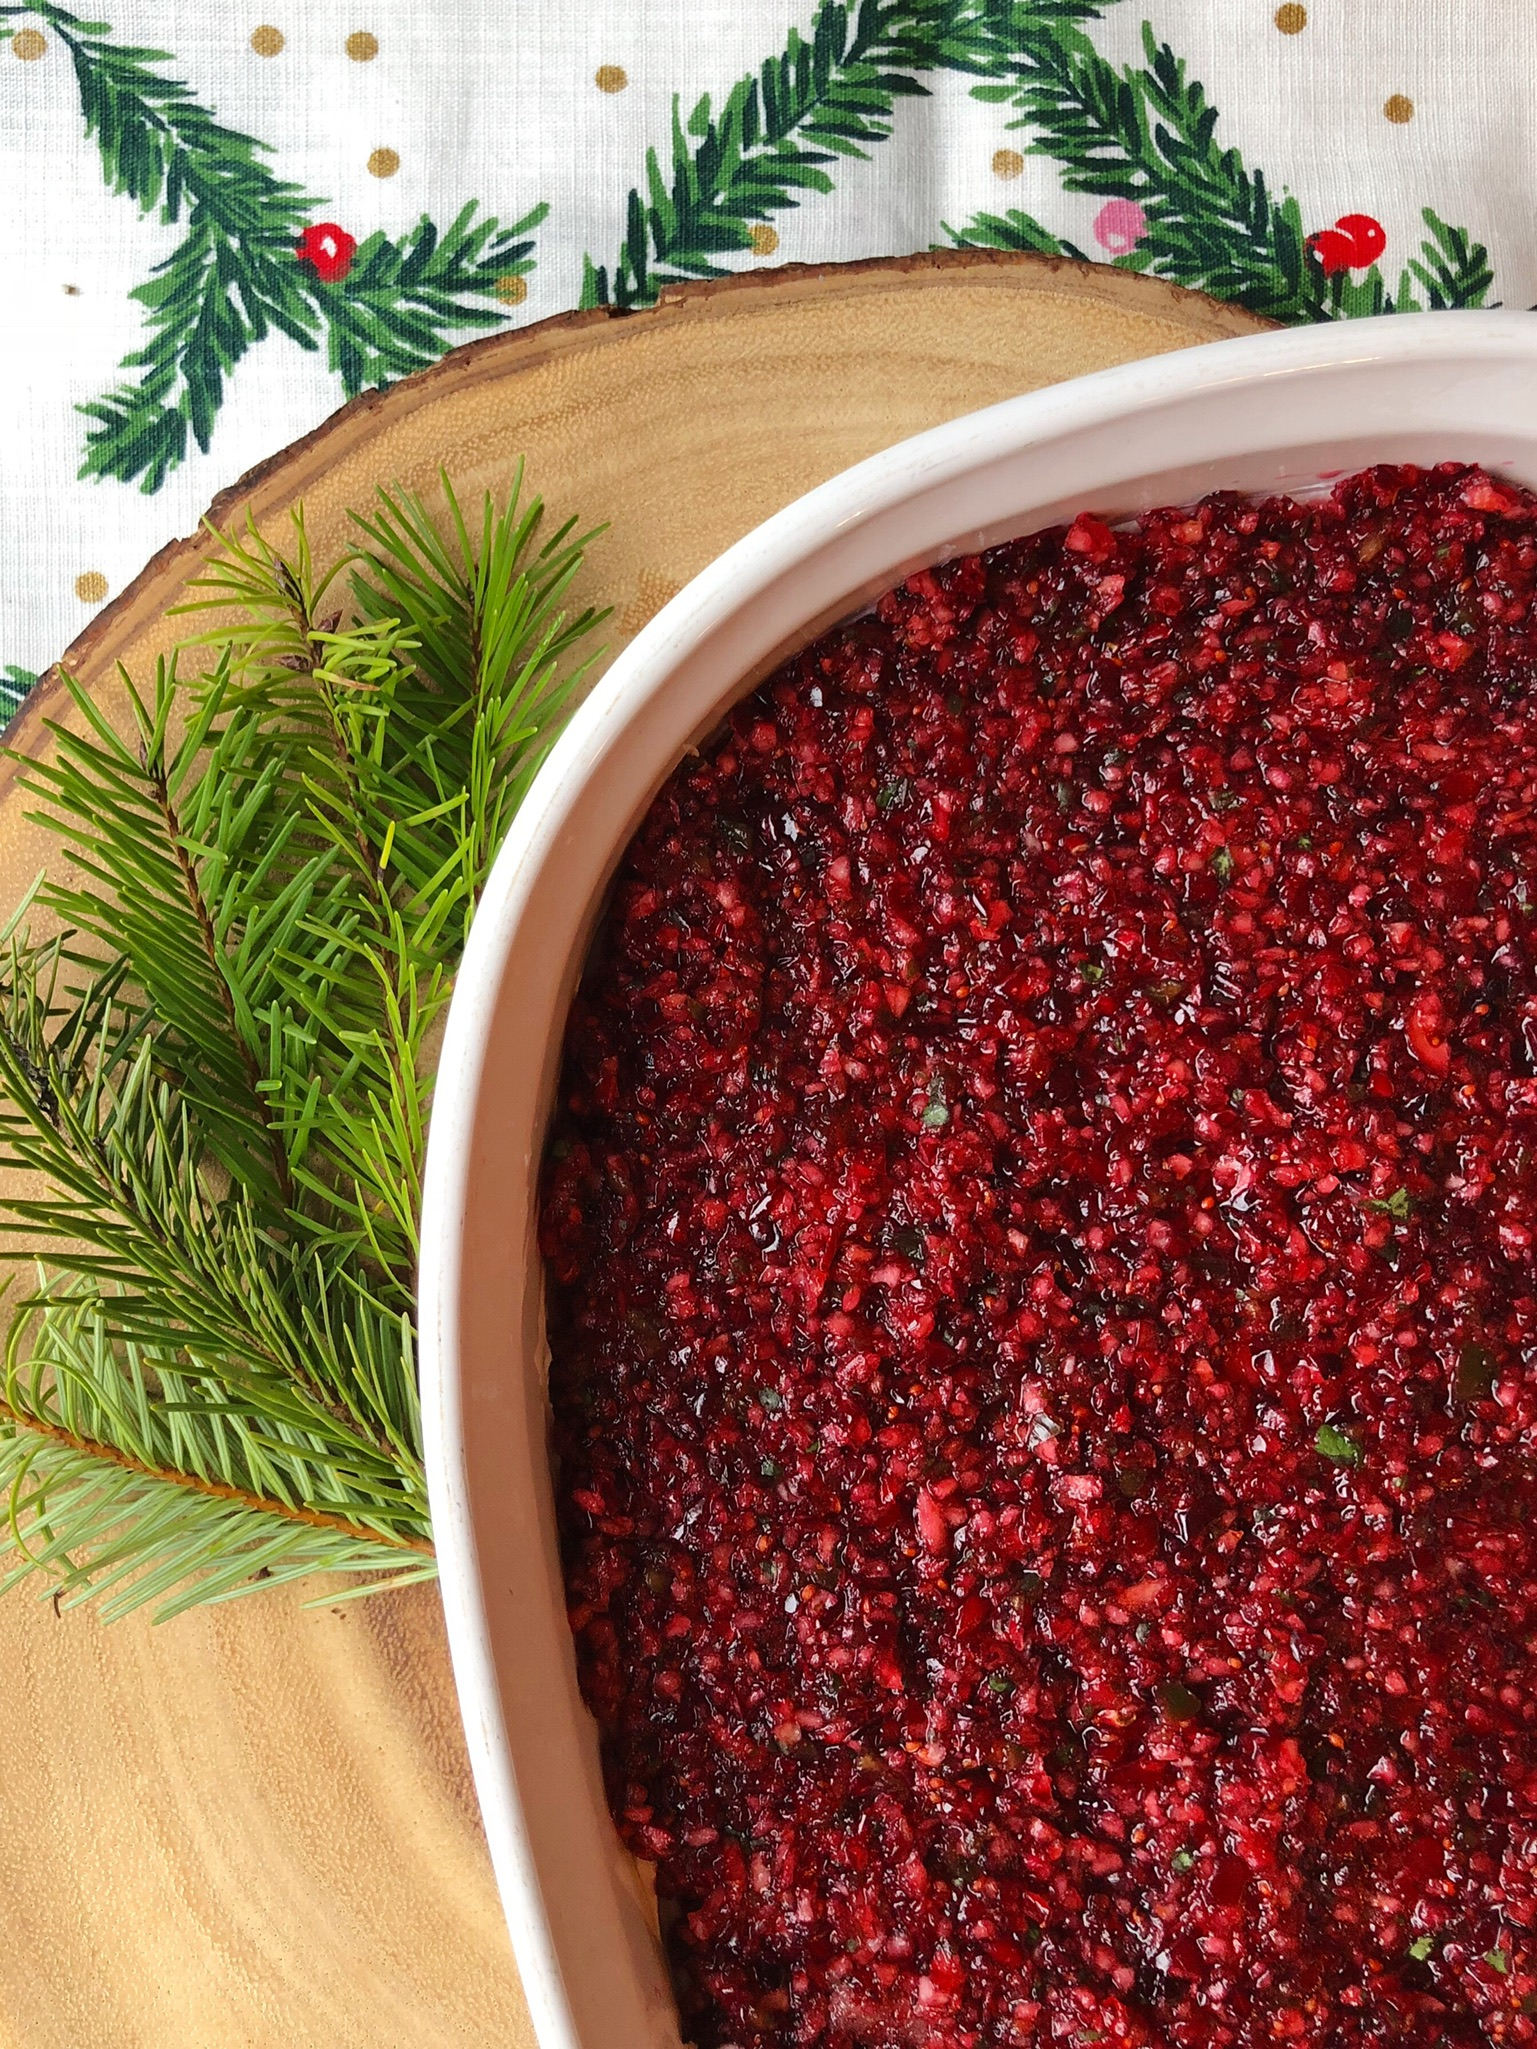 line & lee cranberry jalapeño dip